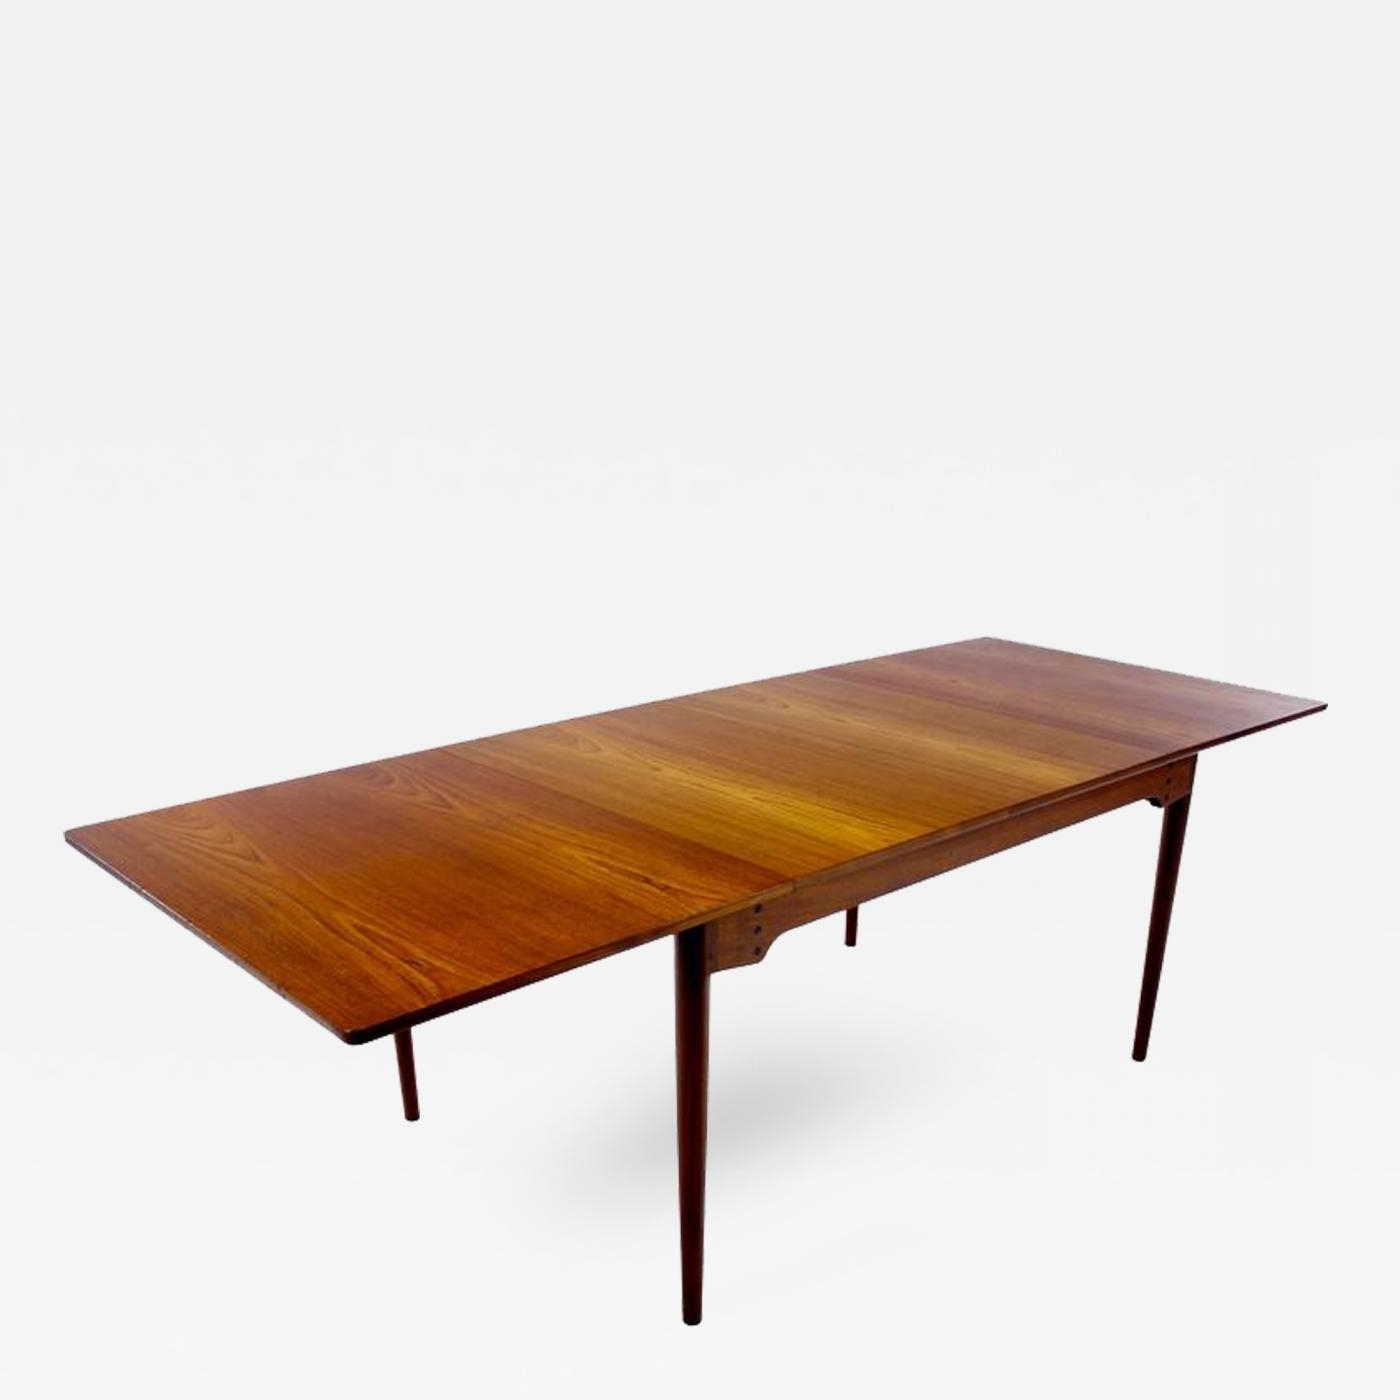 Finn Juhl – Danish Modern Teak Dining Table Designedfinn Juhl Pertaining To Most Popular Danish Dining Tables (View 24 of 25)